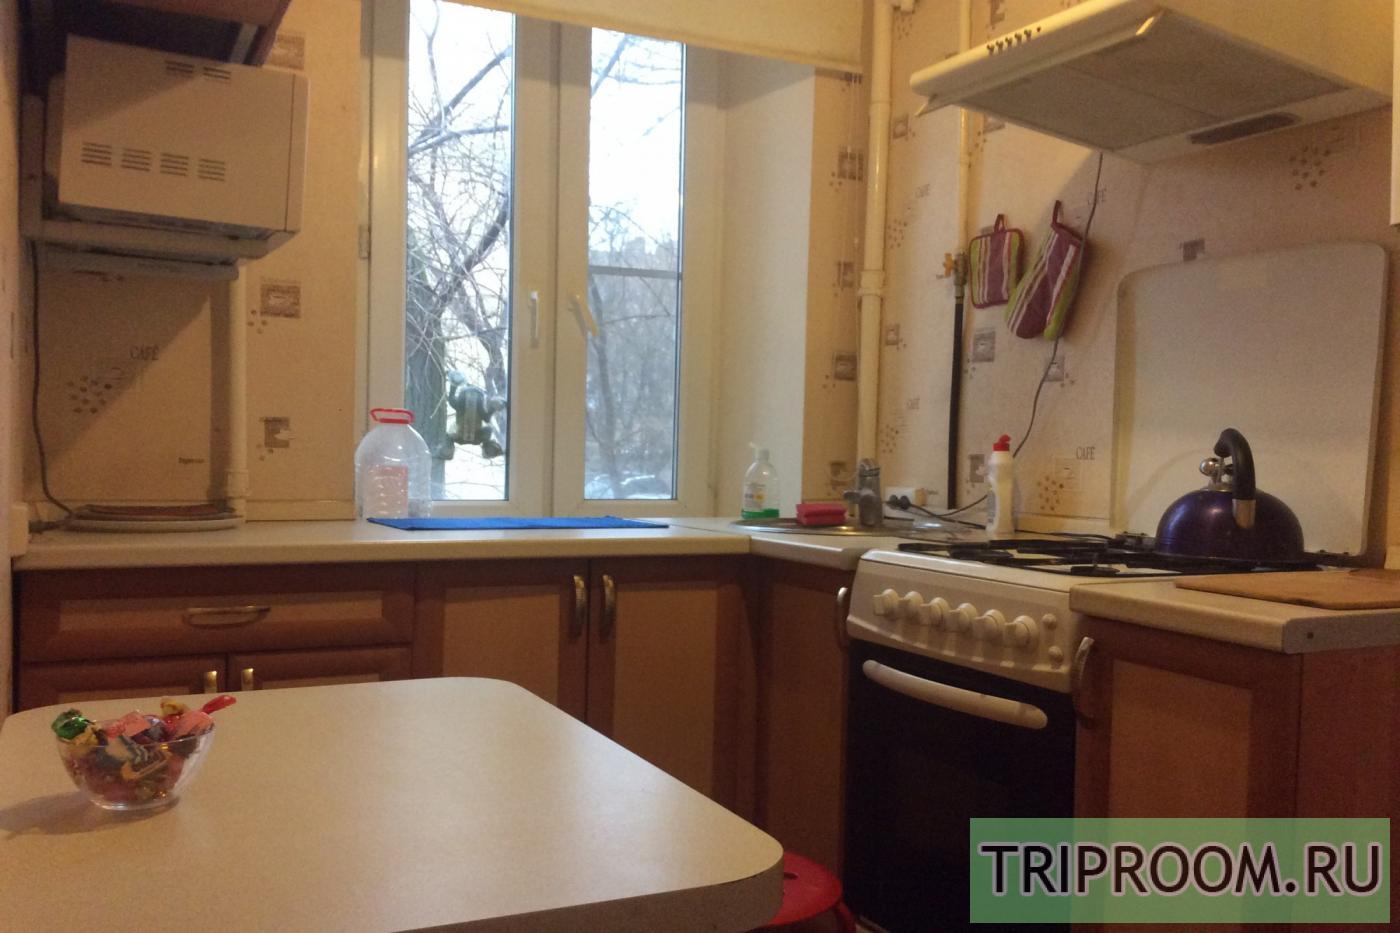 2-комнатная квартира посуточно (вариант № 23910), ул. М. Нагибина проспект, фото № 3